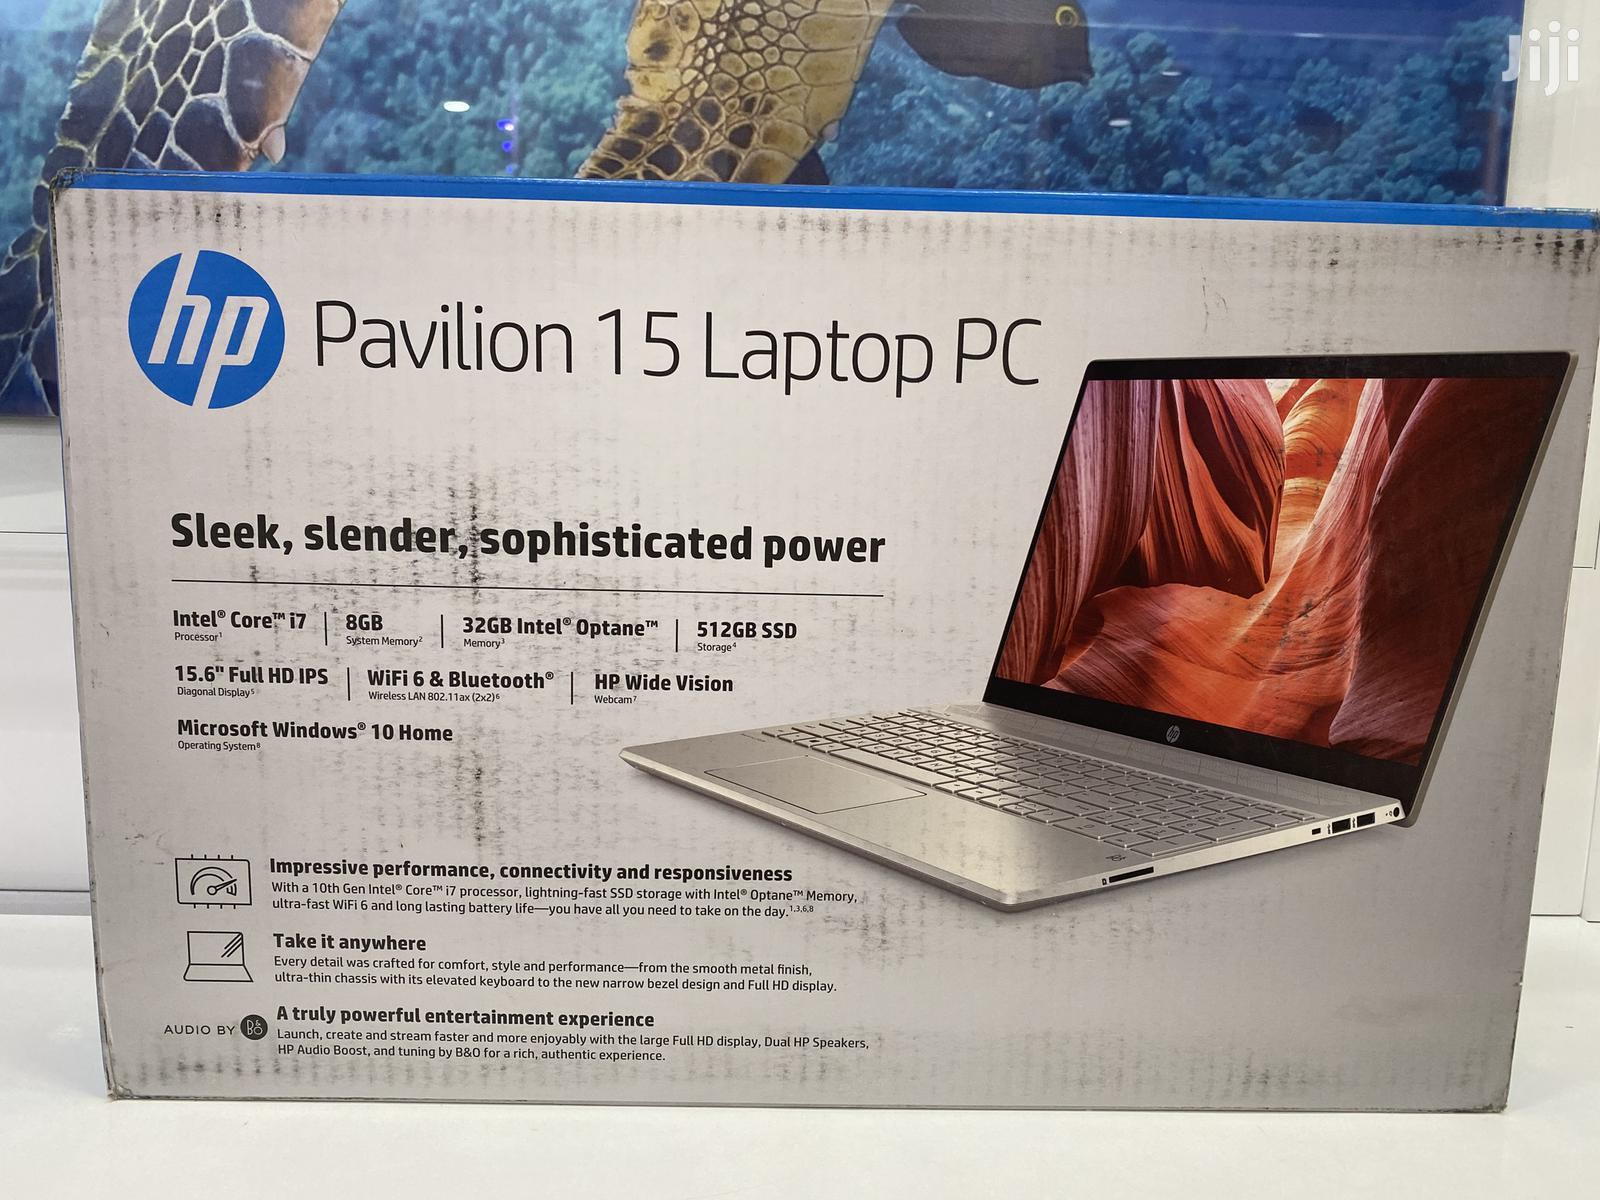 New Laptop HP Pavilion 15 8GB Intel Core i7 SSD 512GB